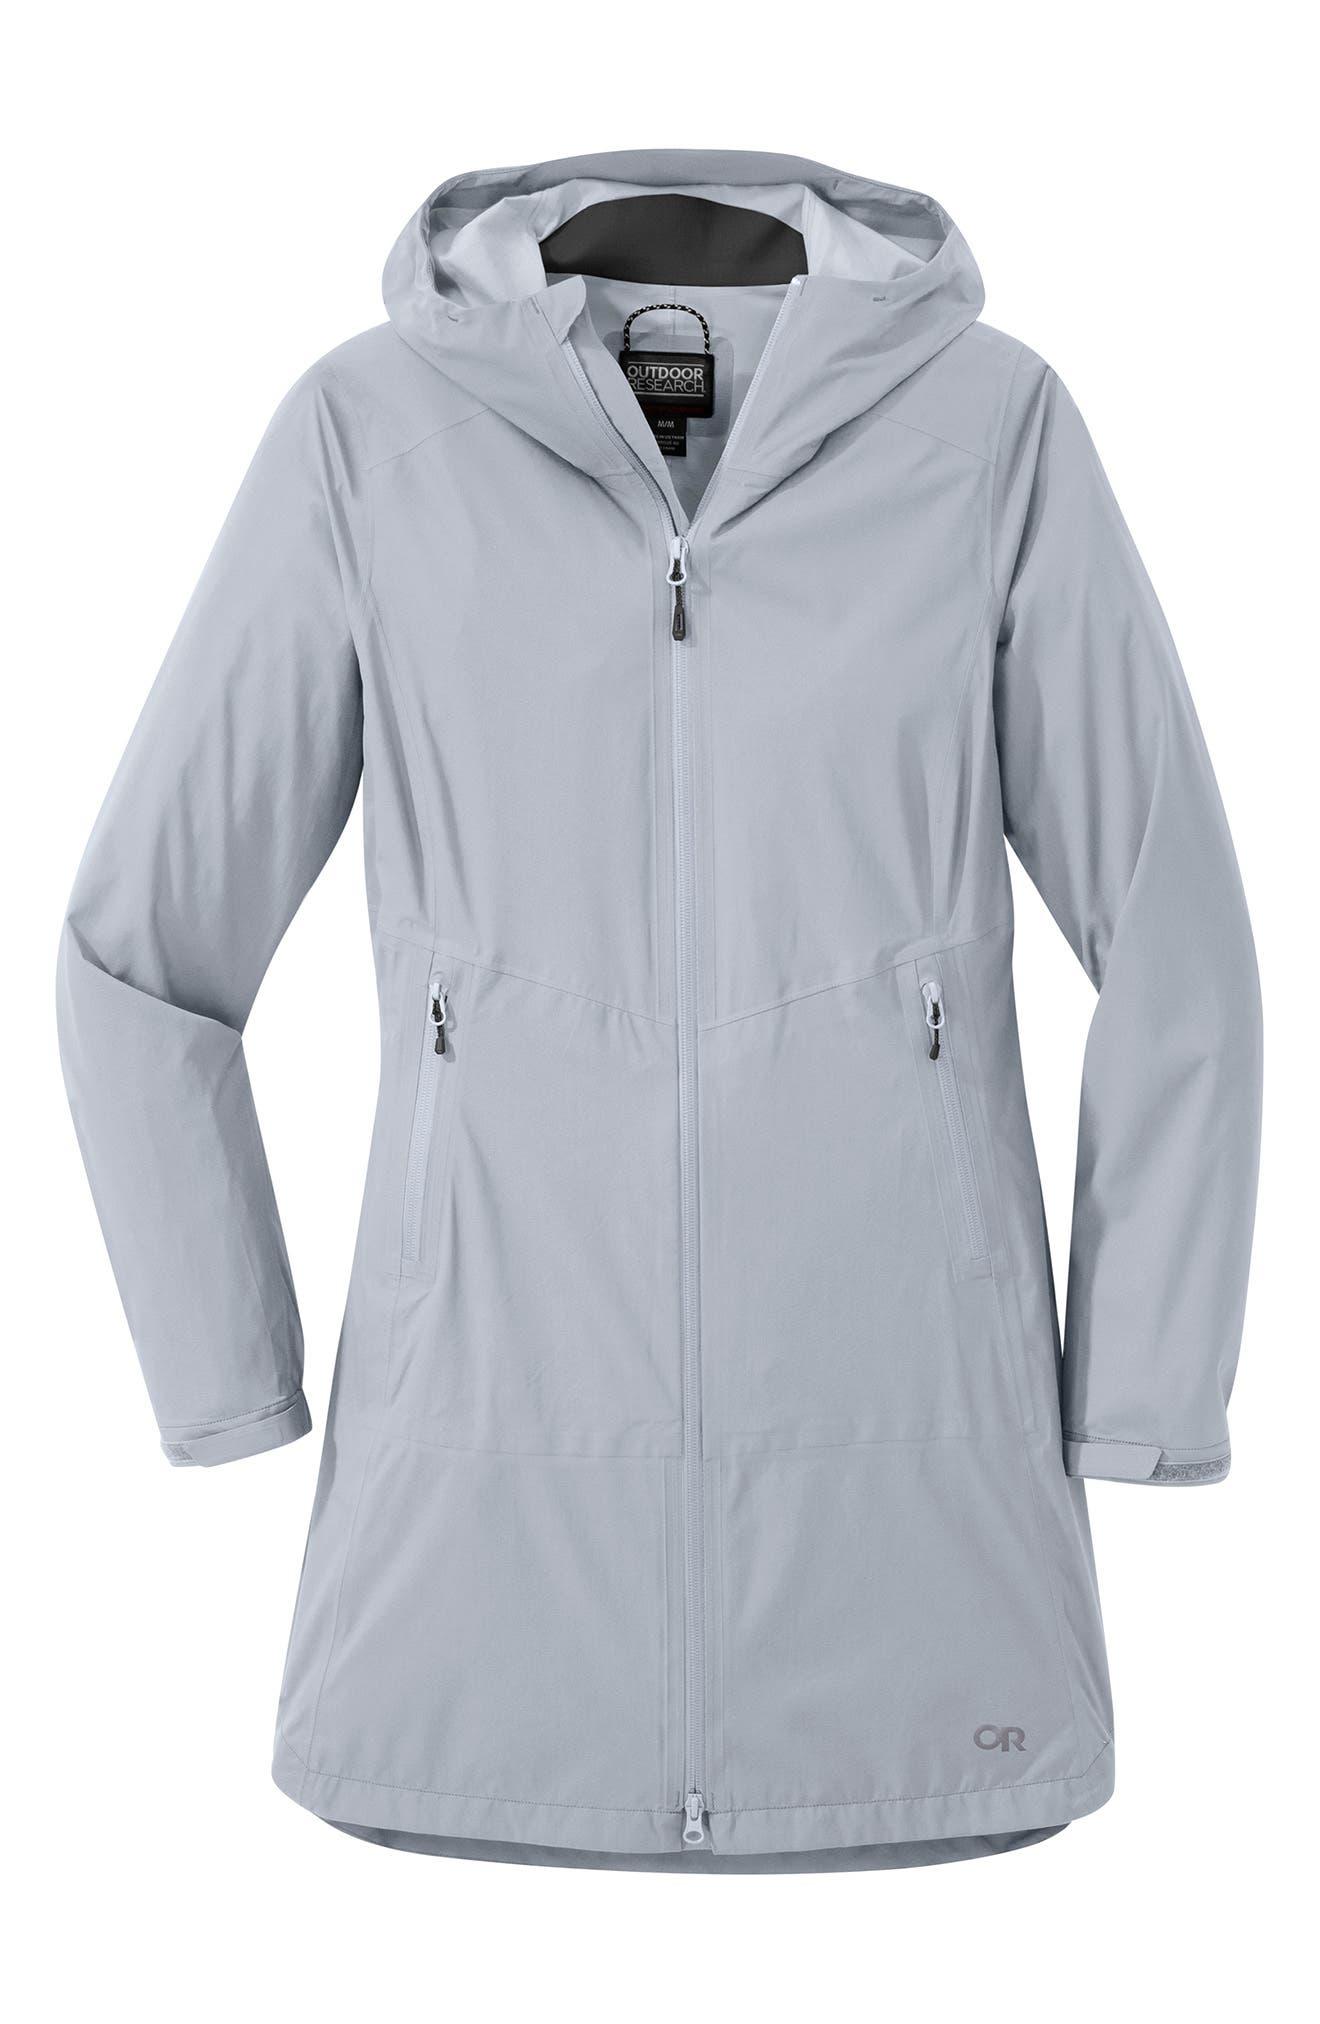 New Arctic Storm Ladies Long Waterproof Dog Walking hiking Coat Jacket size 12